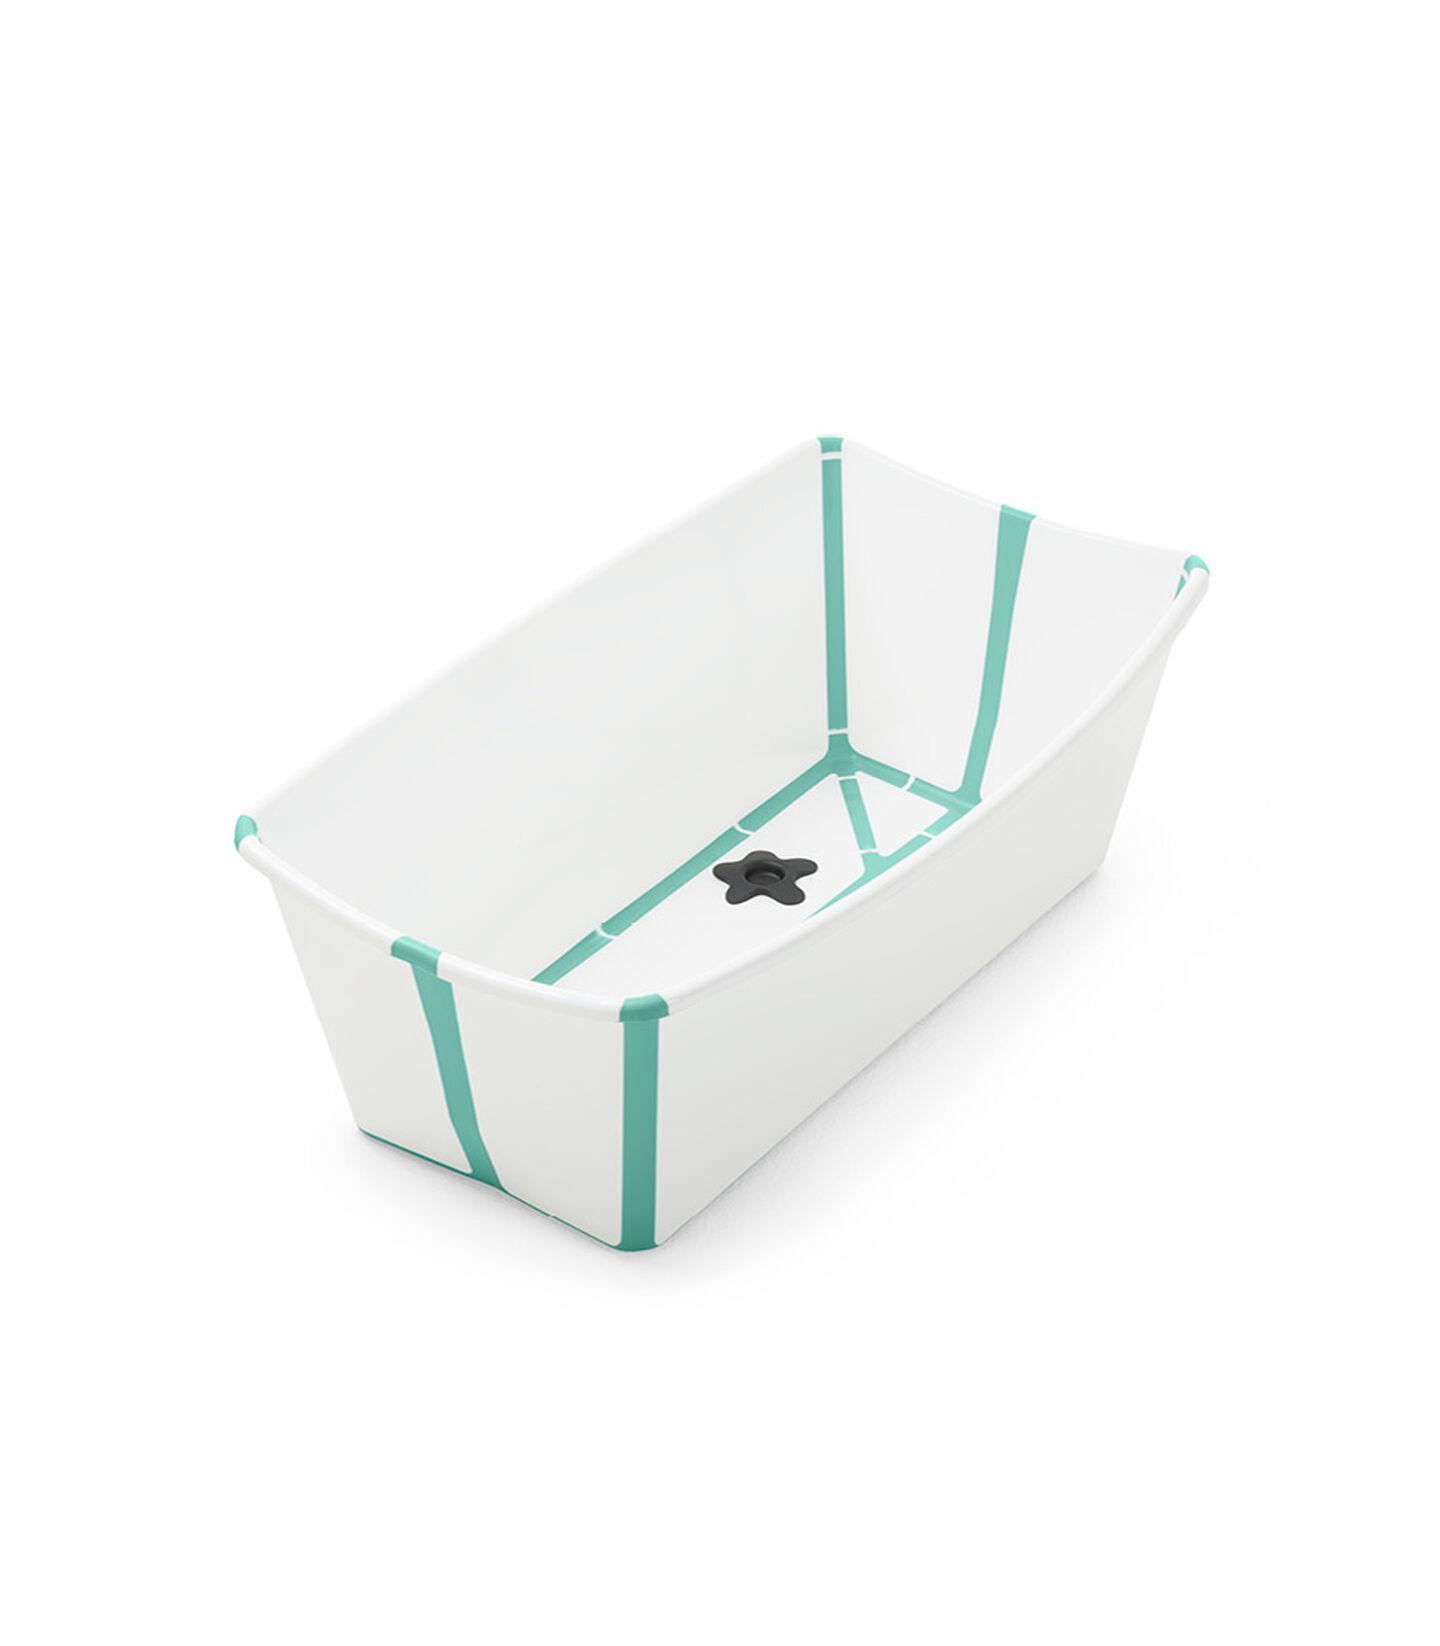 Stokke® Flexi Bath® Heat White Aqua, White Aqua, mainview view 2